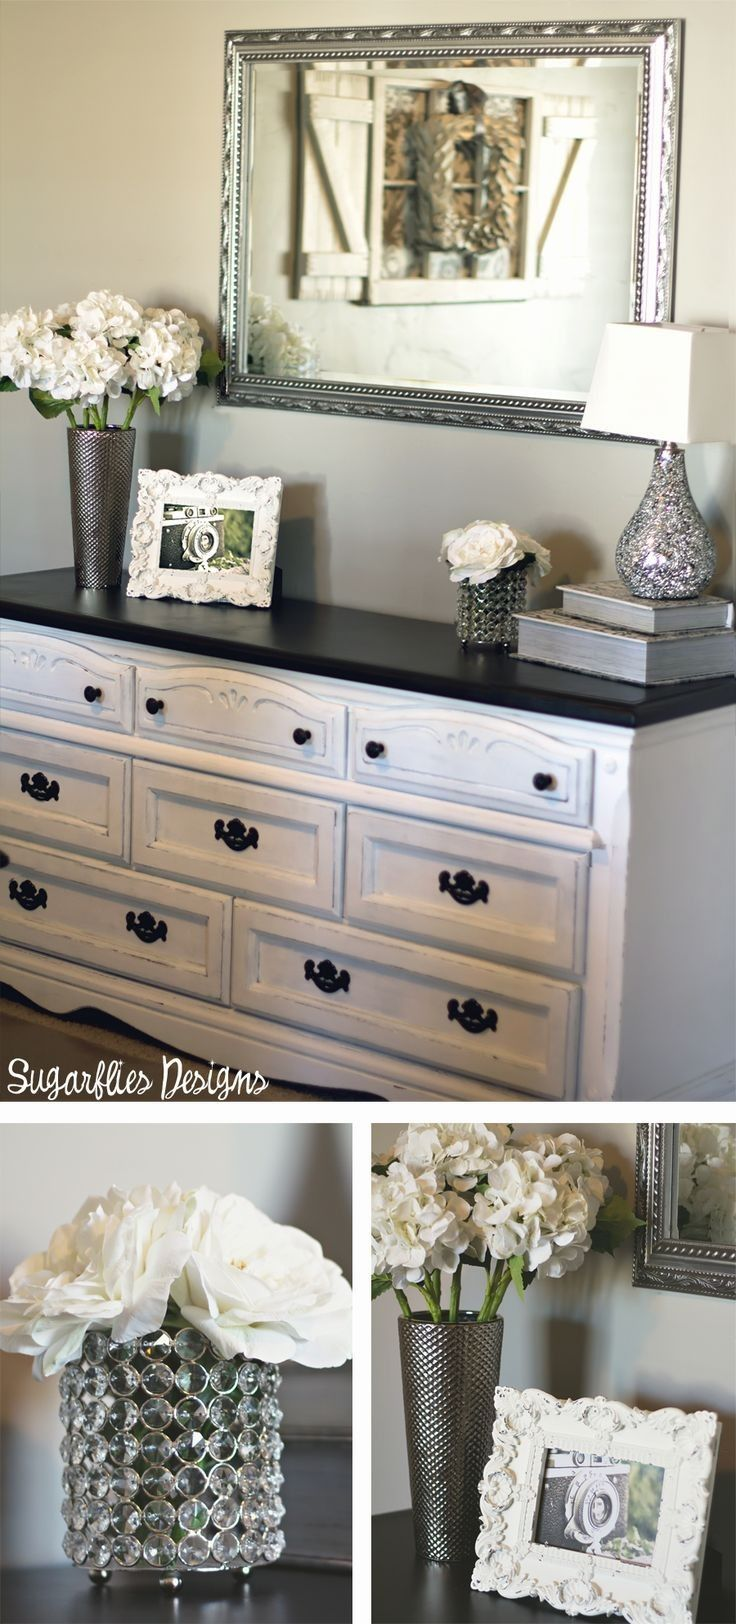 Bedroom Dresser Decorating Ideas Inspirational Best 25 Dresser Top Decor Ideas On Pinterest Dresser Decor Home Bedroom Home Decor